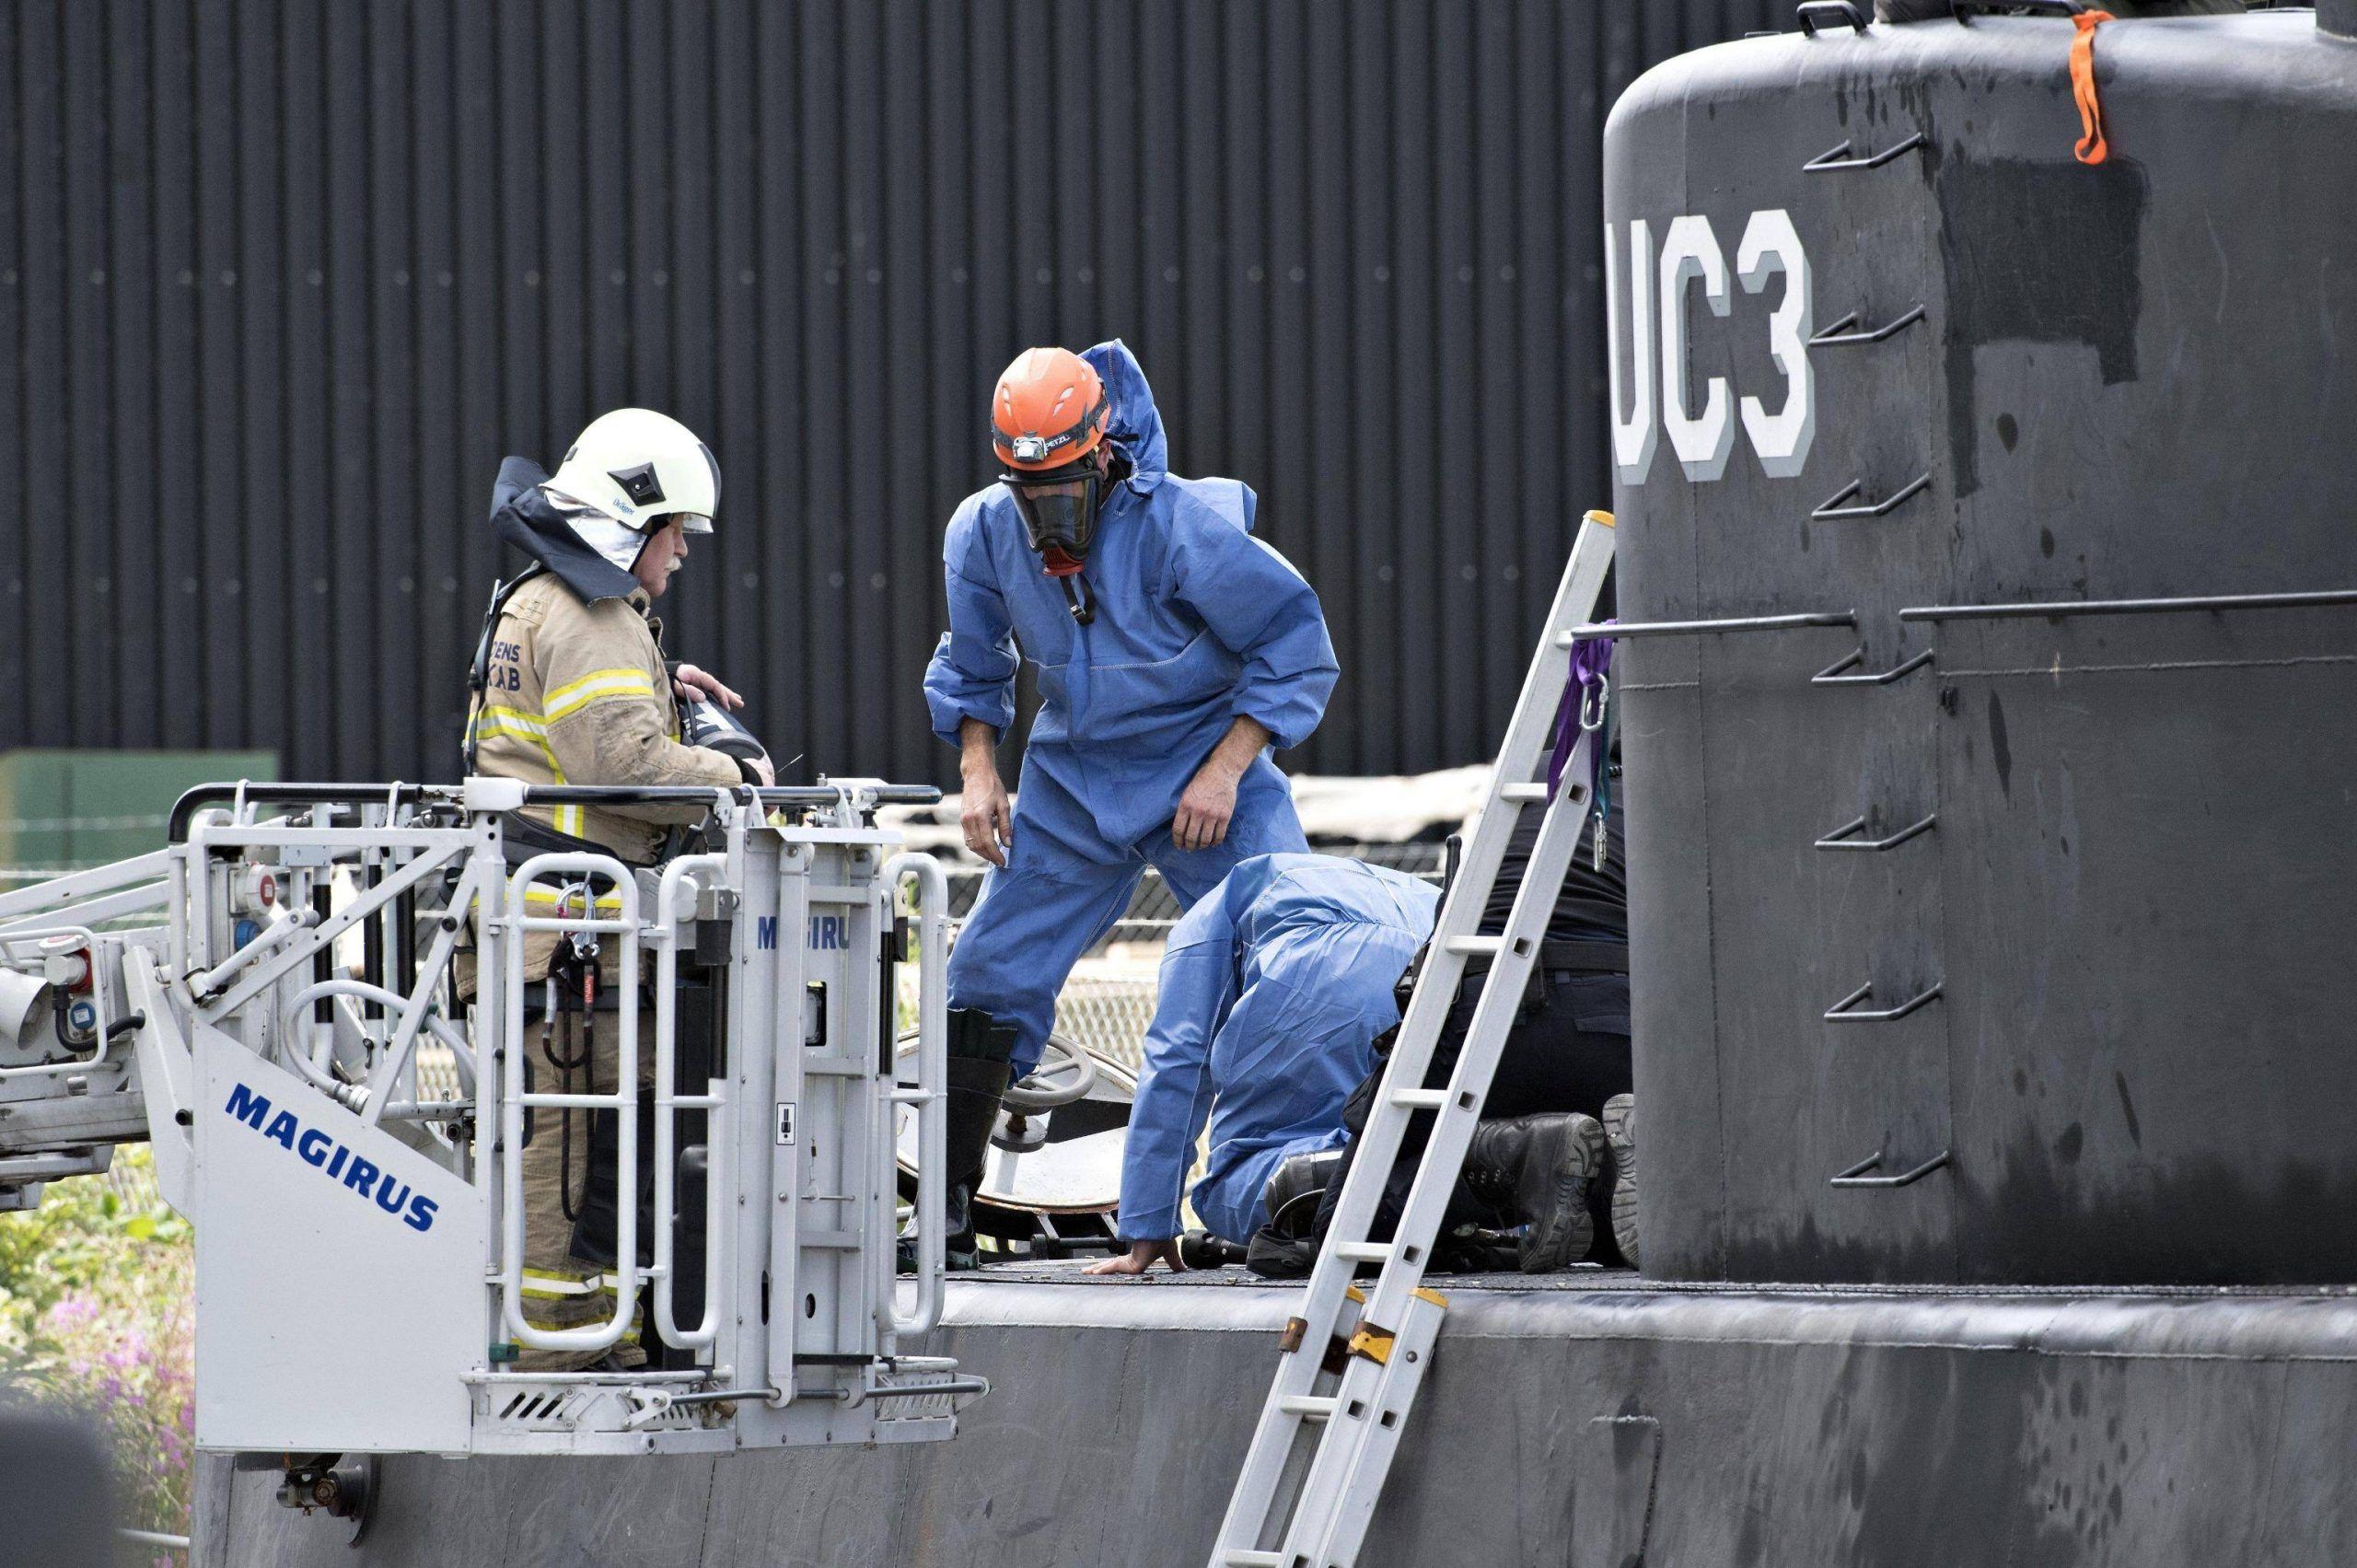 Sottomarino Nautilus UC3